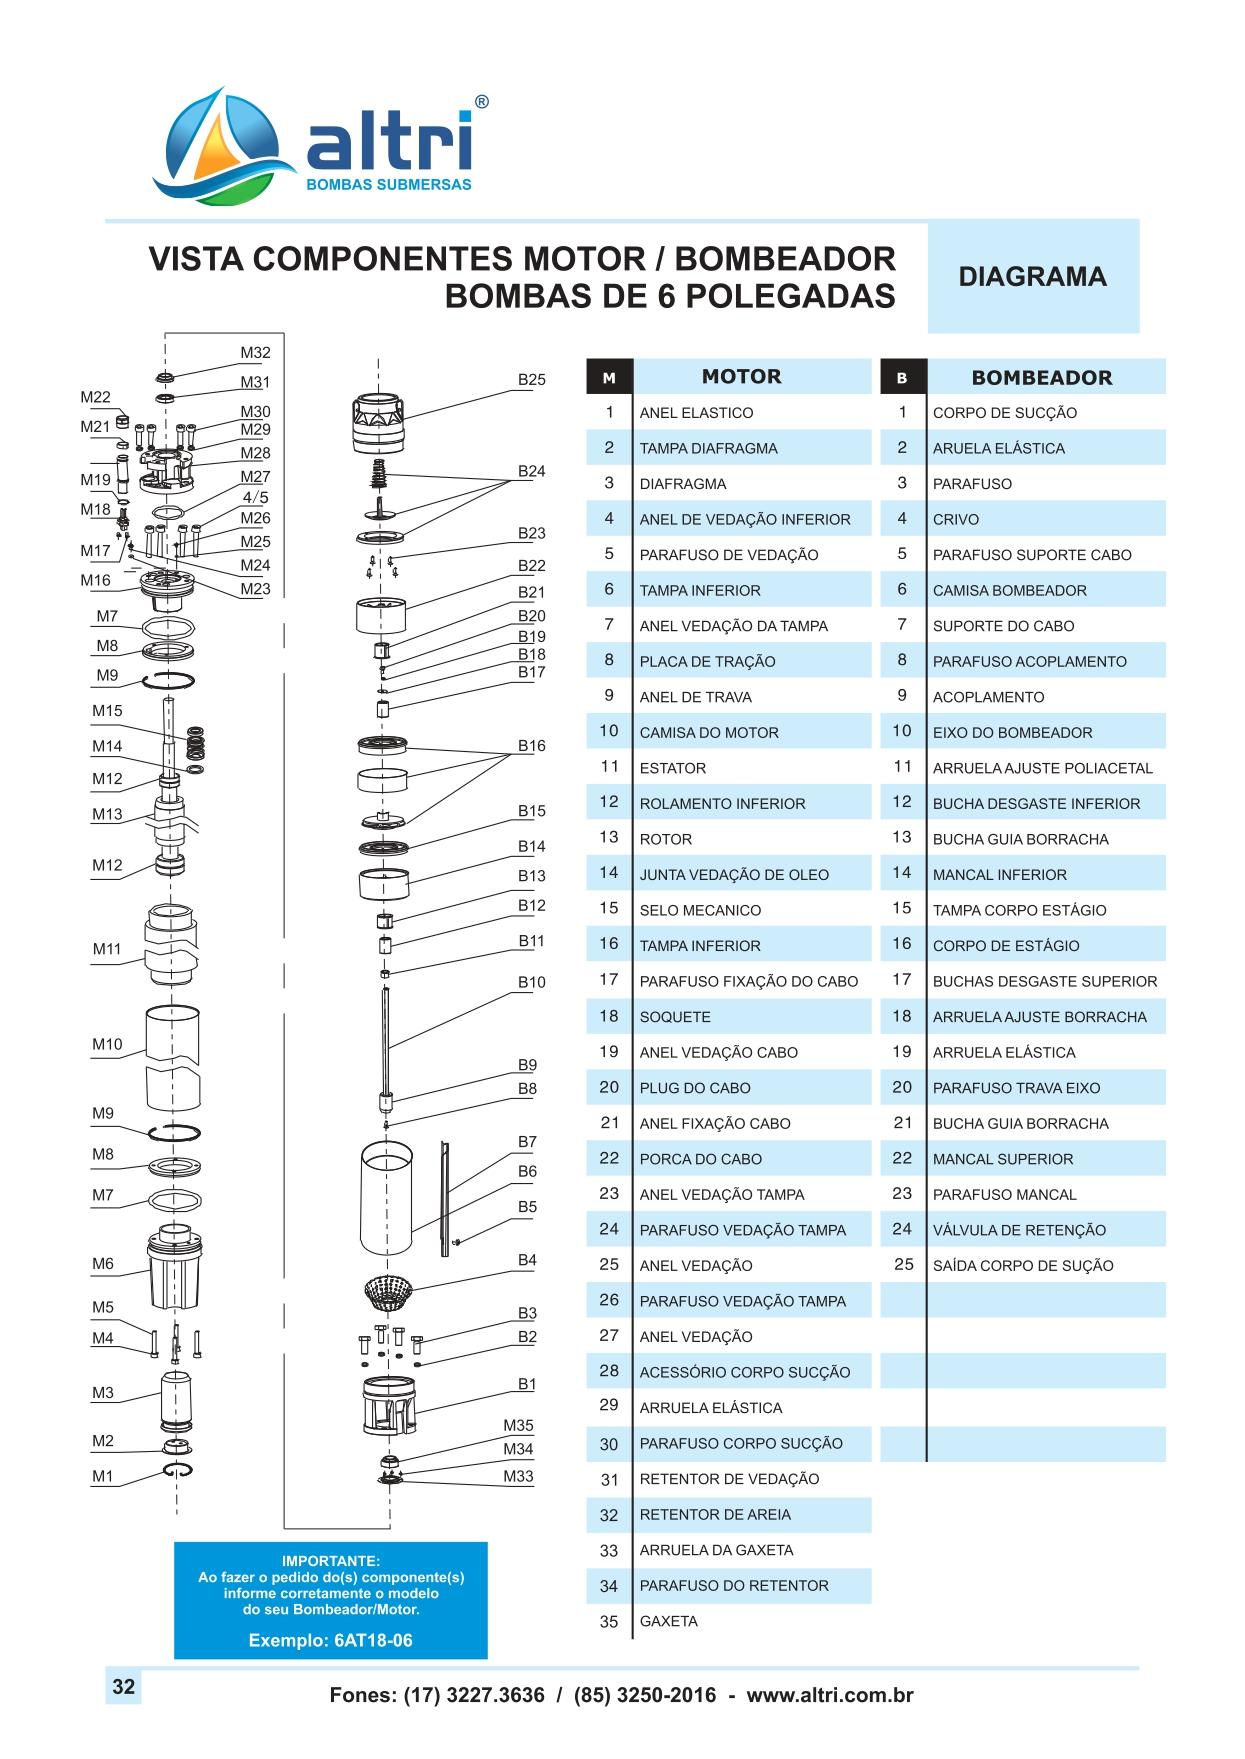 CATALOGO DE PRODUTOS ALTRI 2021 - WEB_page-0034